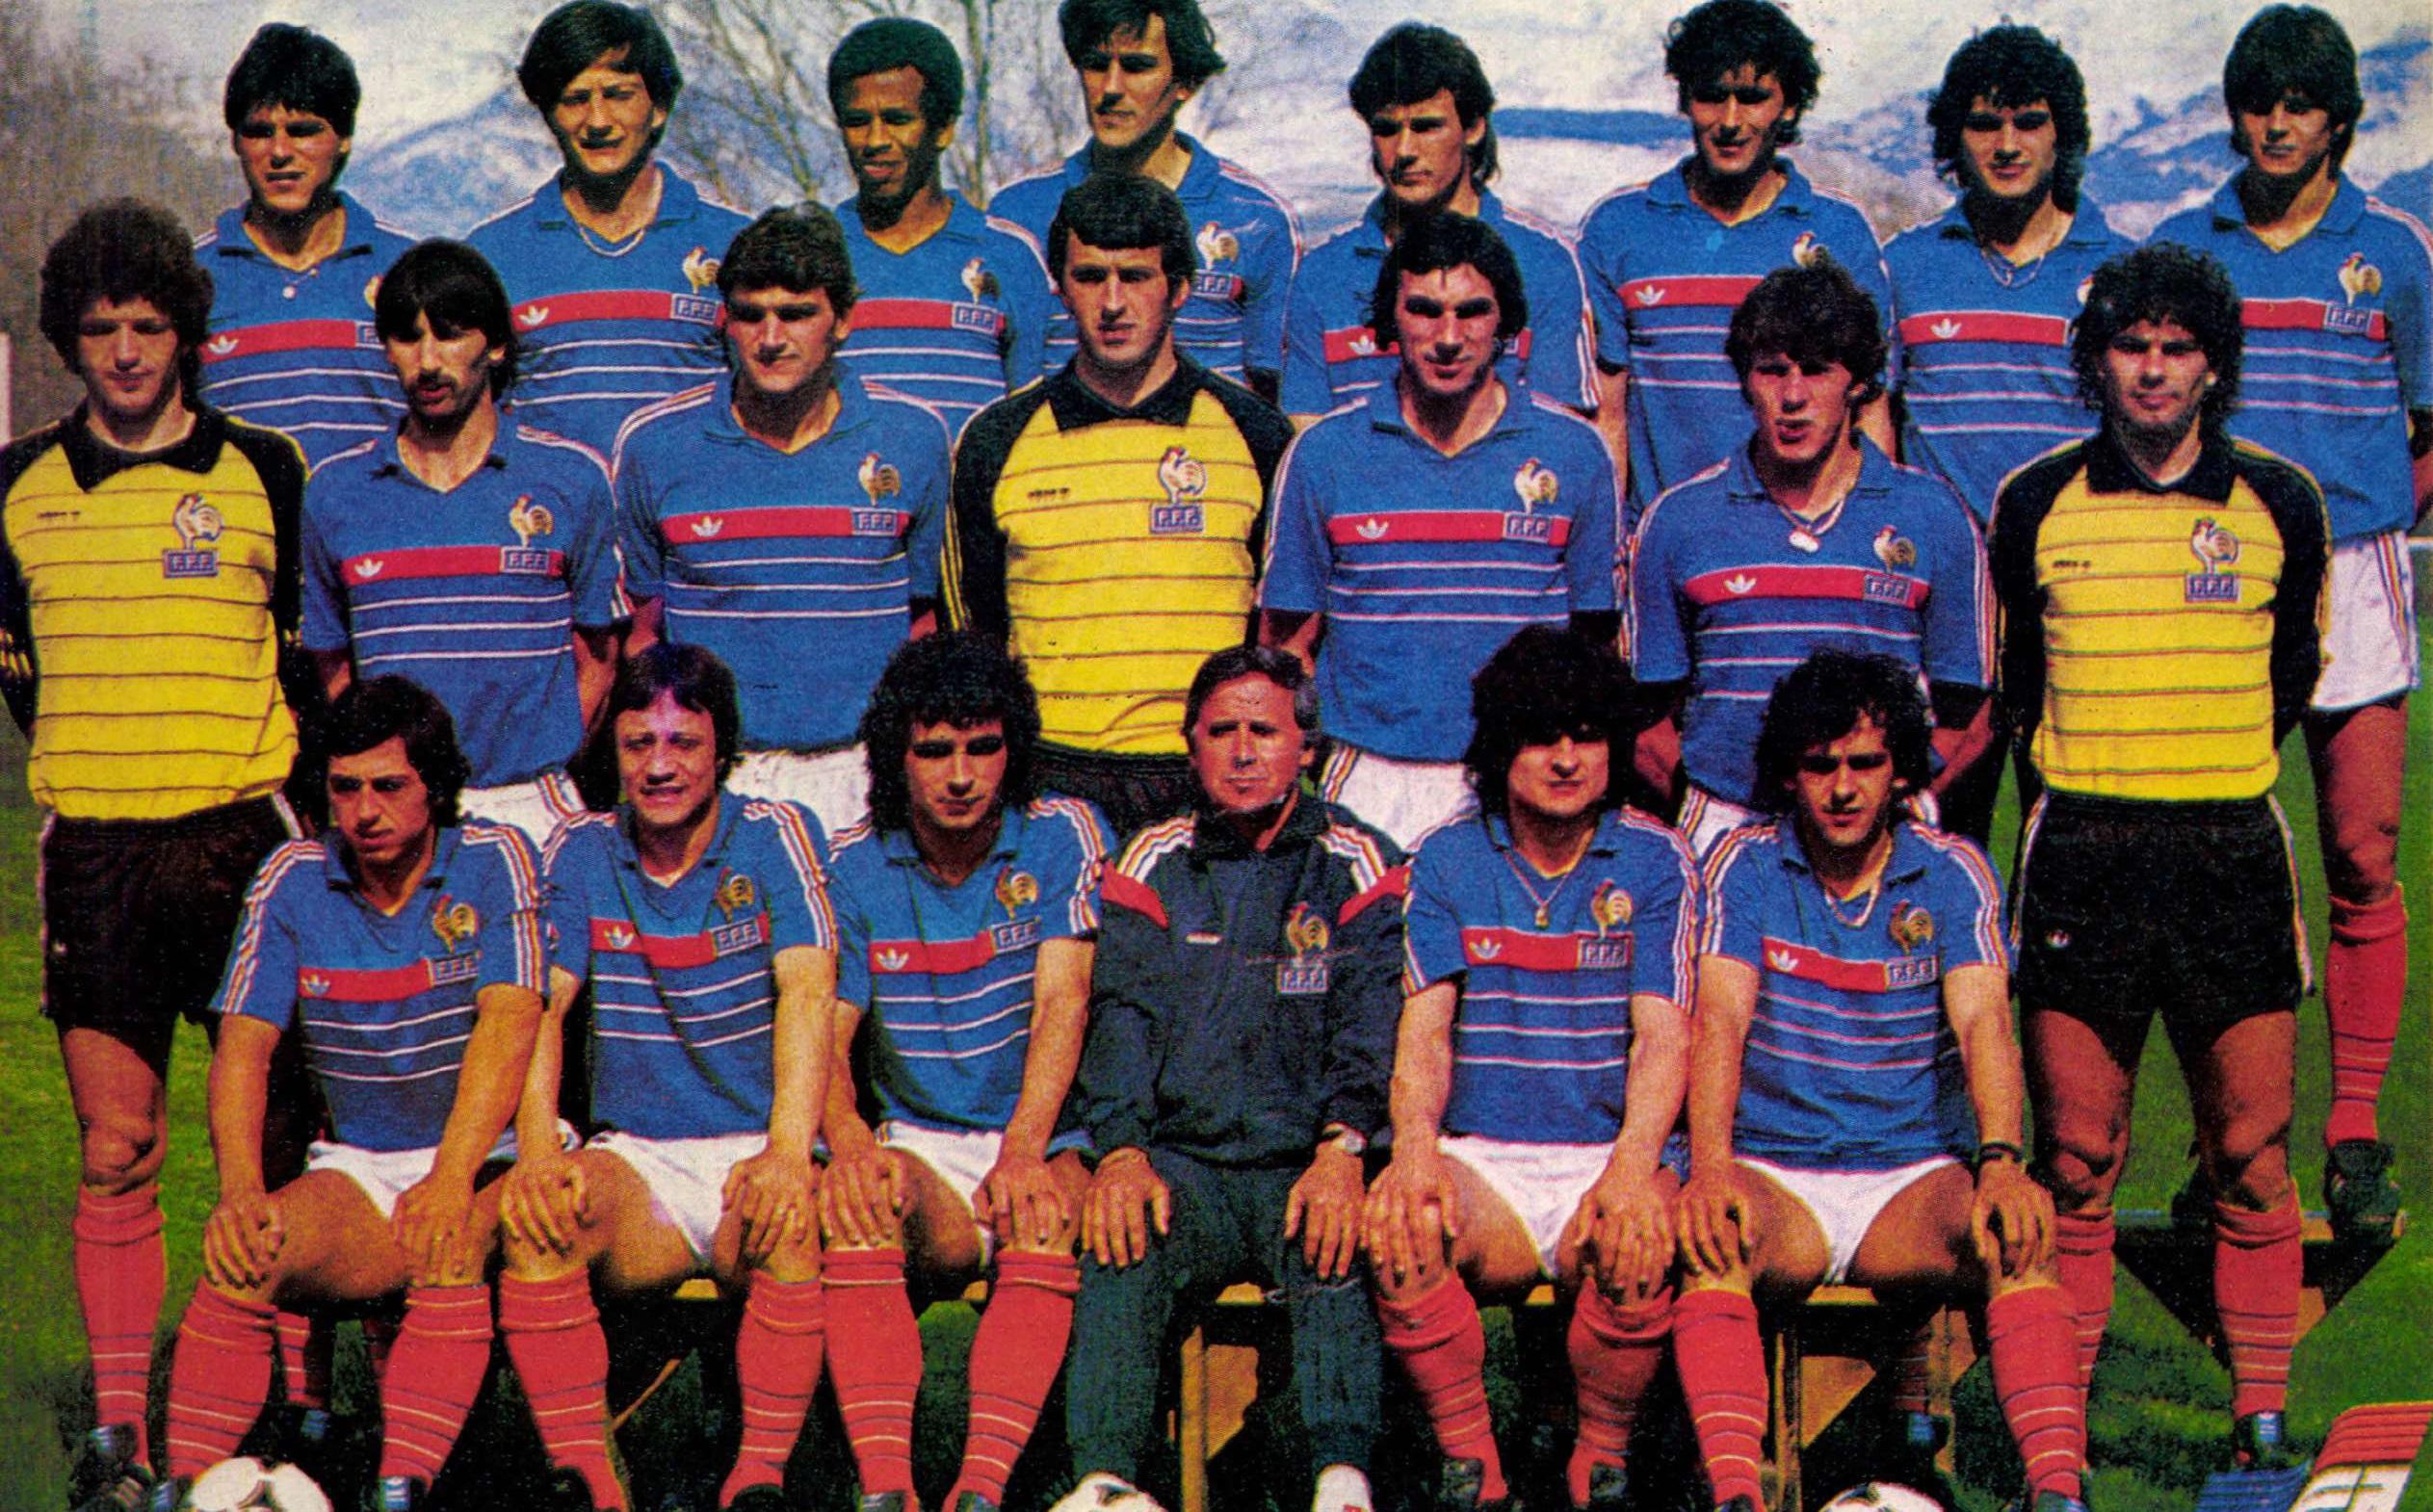 idokapszula_1984_franciaorszagi_labdarugo_europa-bajnoksag_elodontok_es_a_donto_franciaorszag_europa_bajnok.jpg